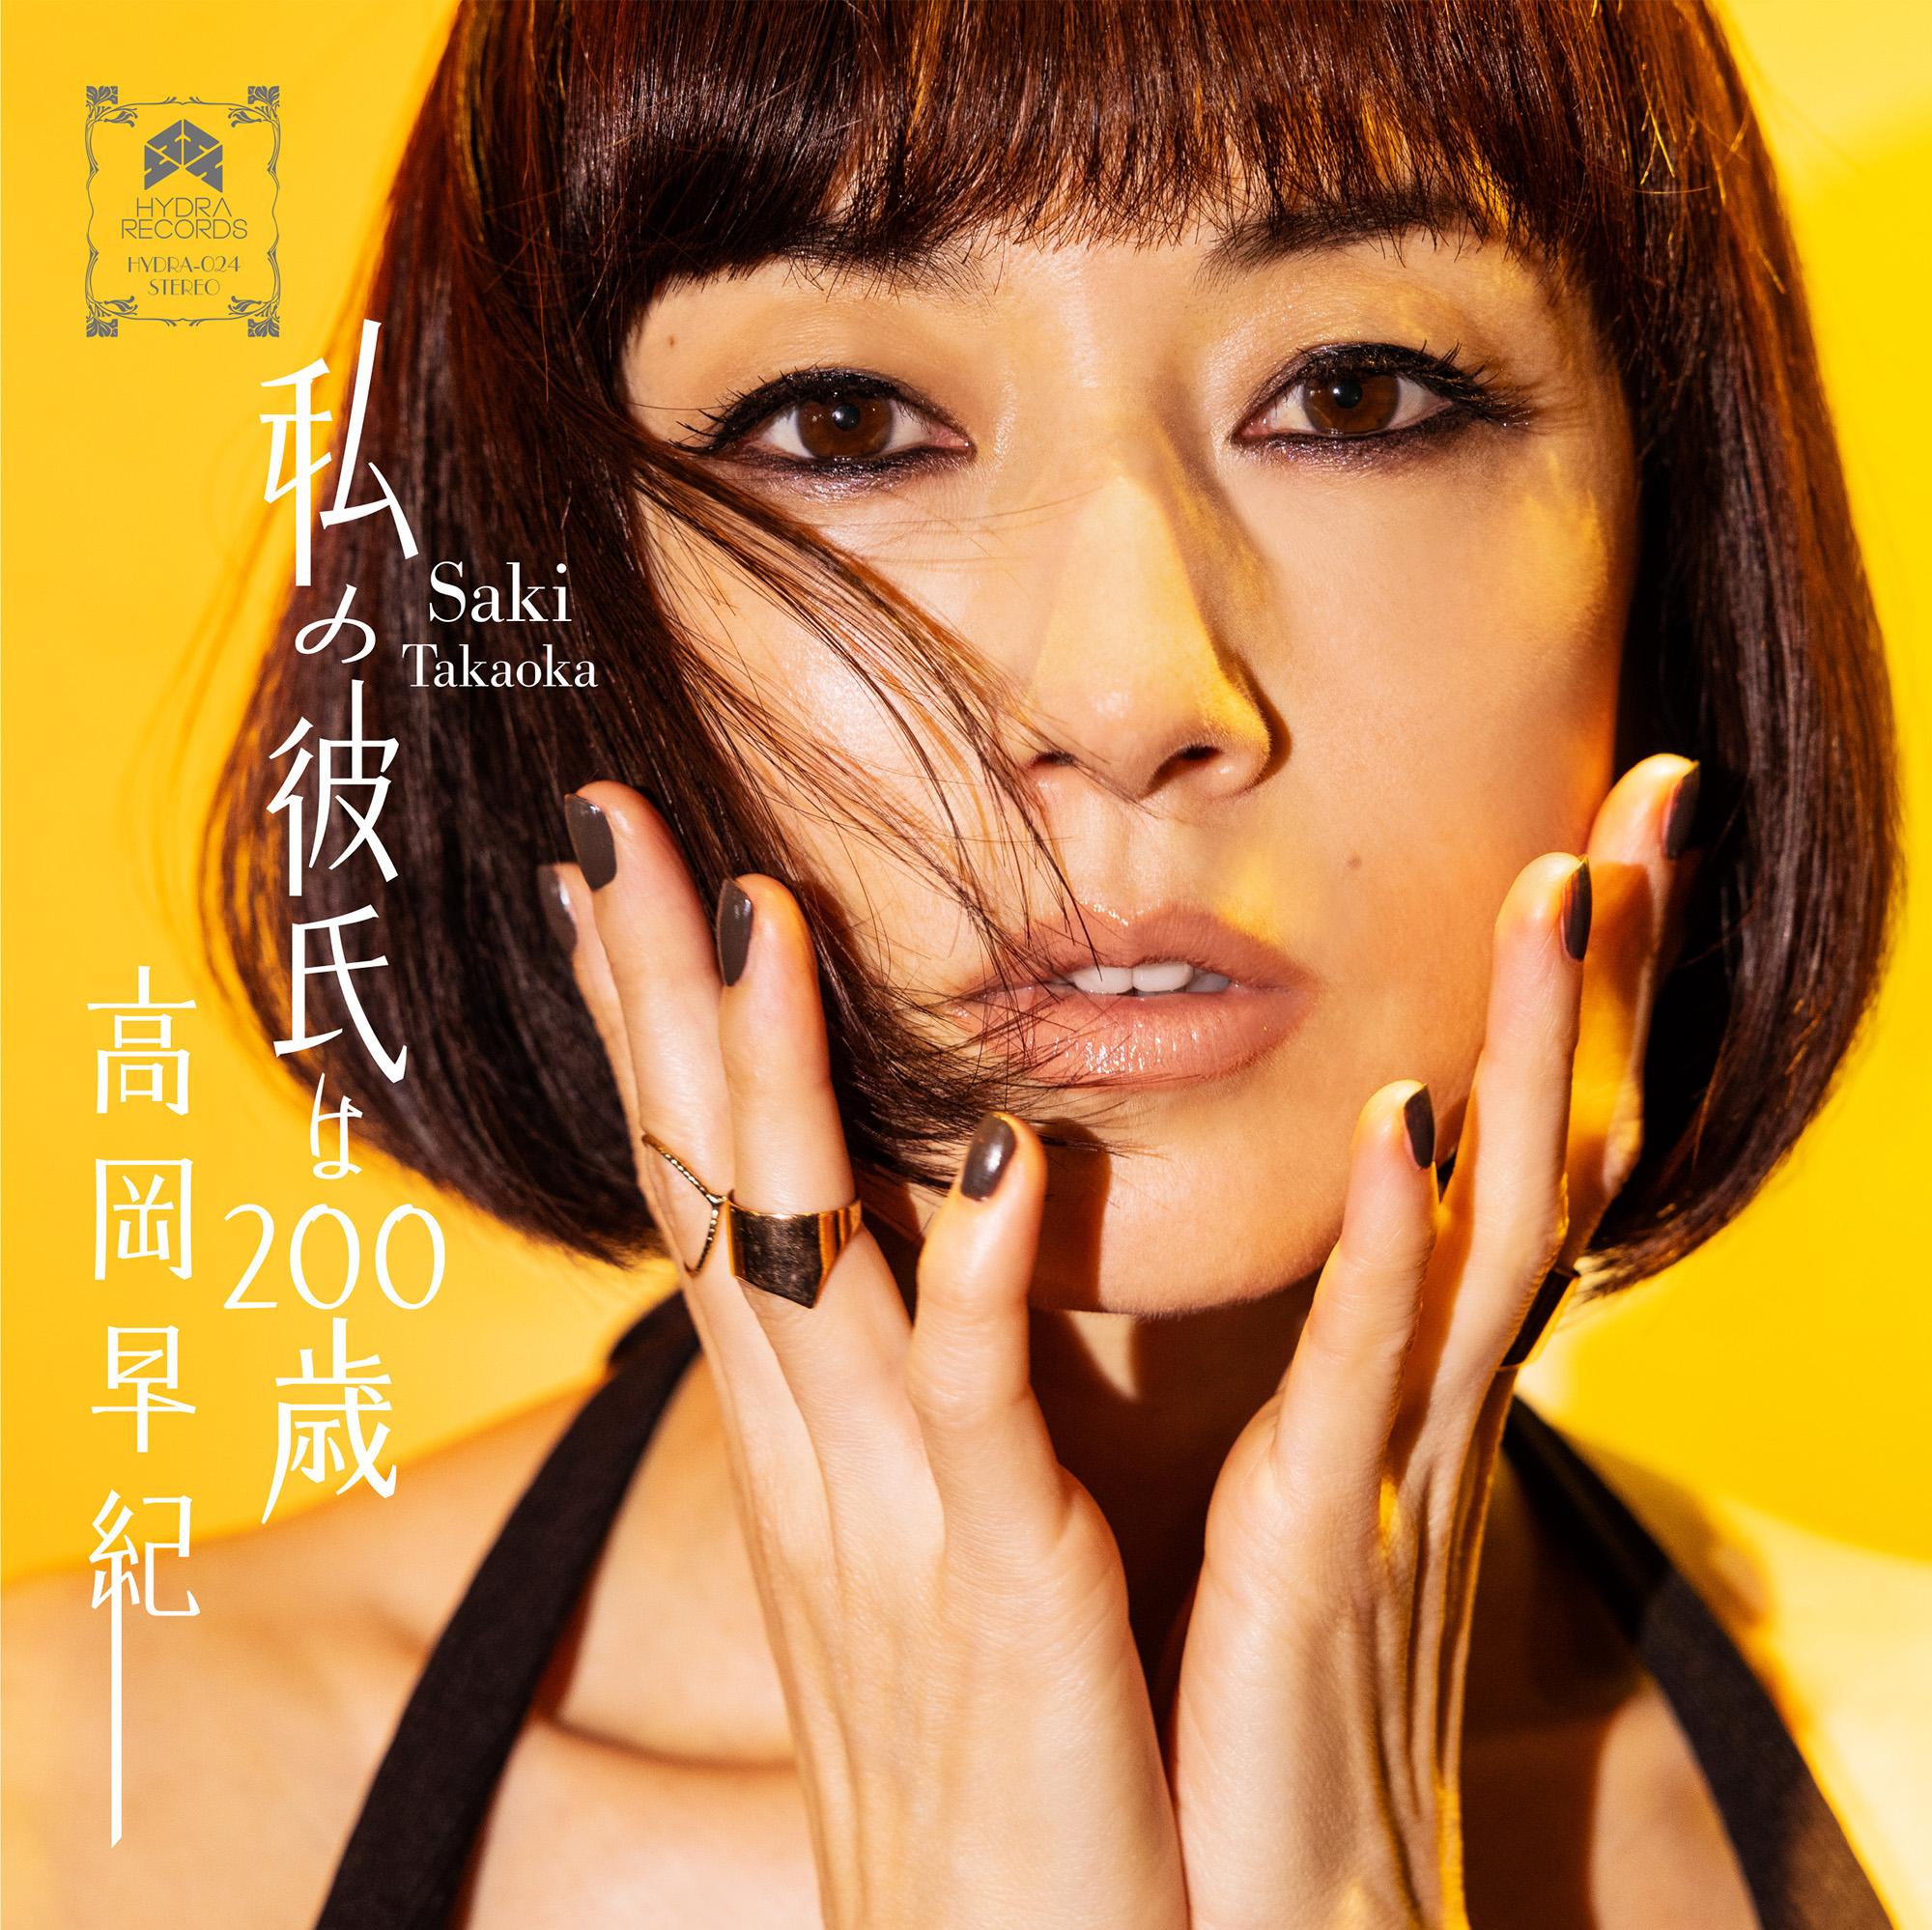 "SAKI TAKAOKA ""私の彼氏は200歳"" (7inch vinyl)2021.9.10 IN STORES!!"